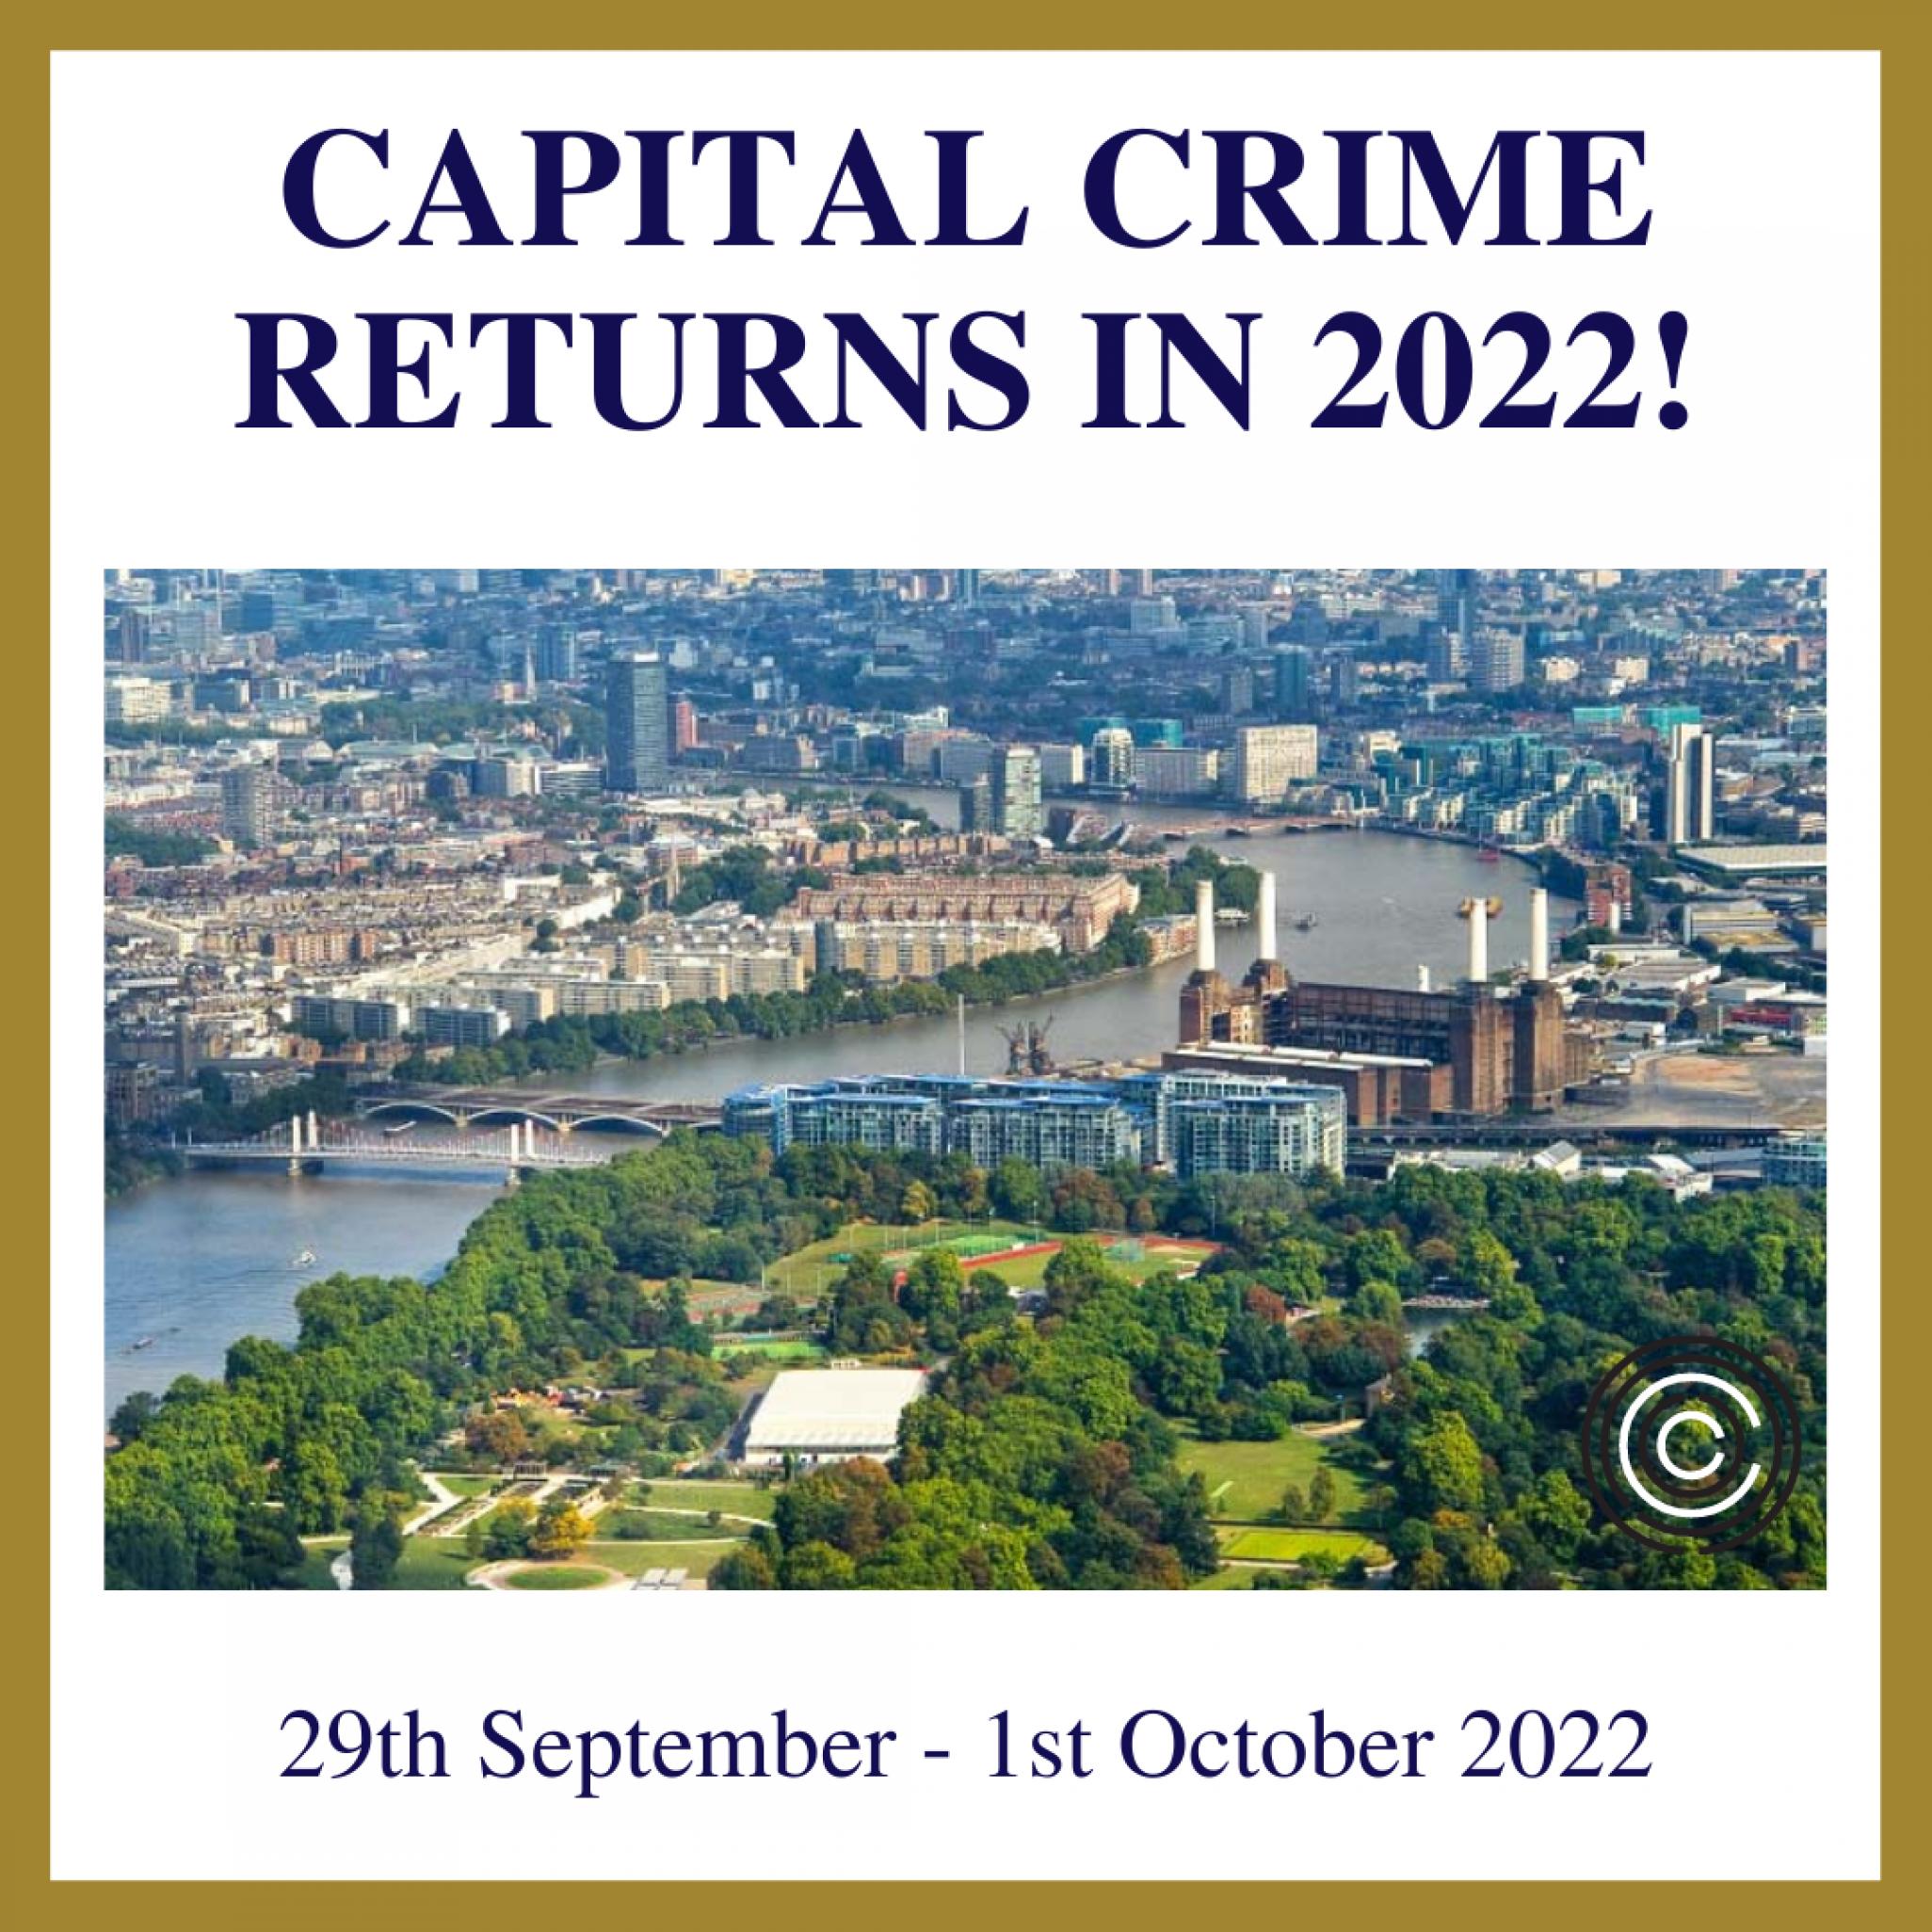 Capital Crime Returns 2022!